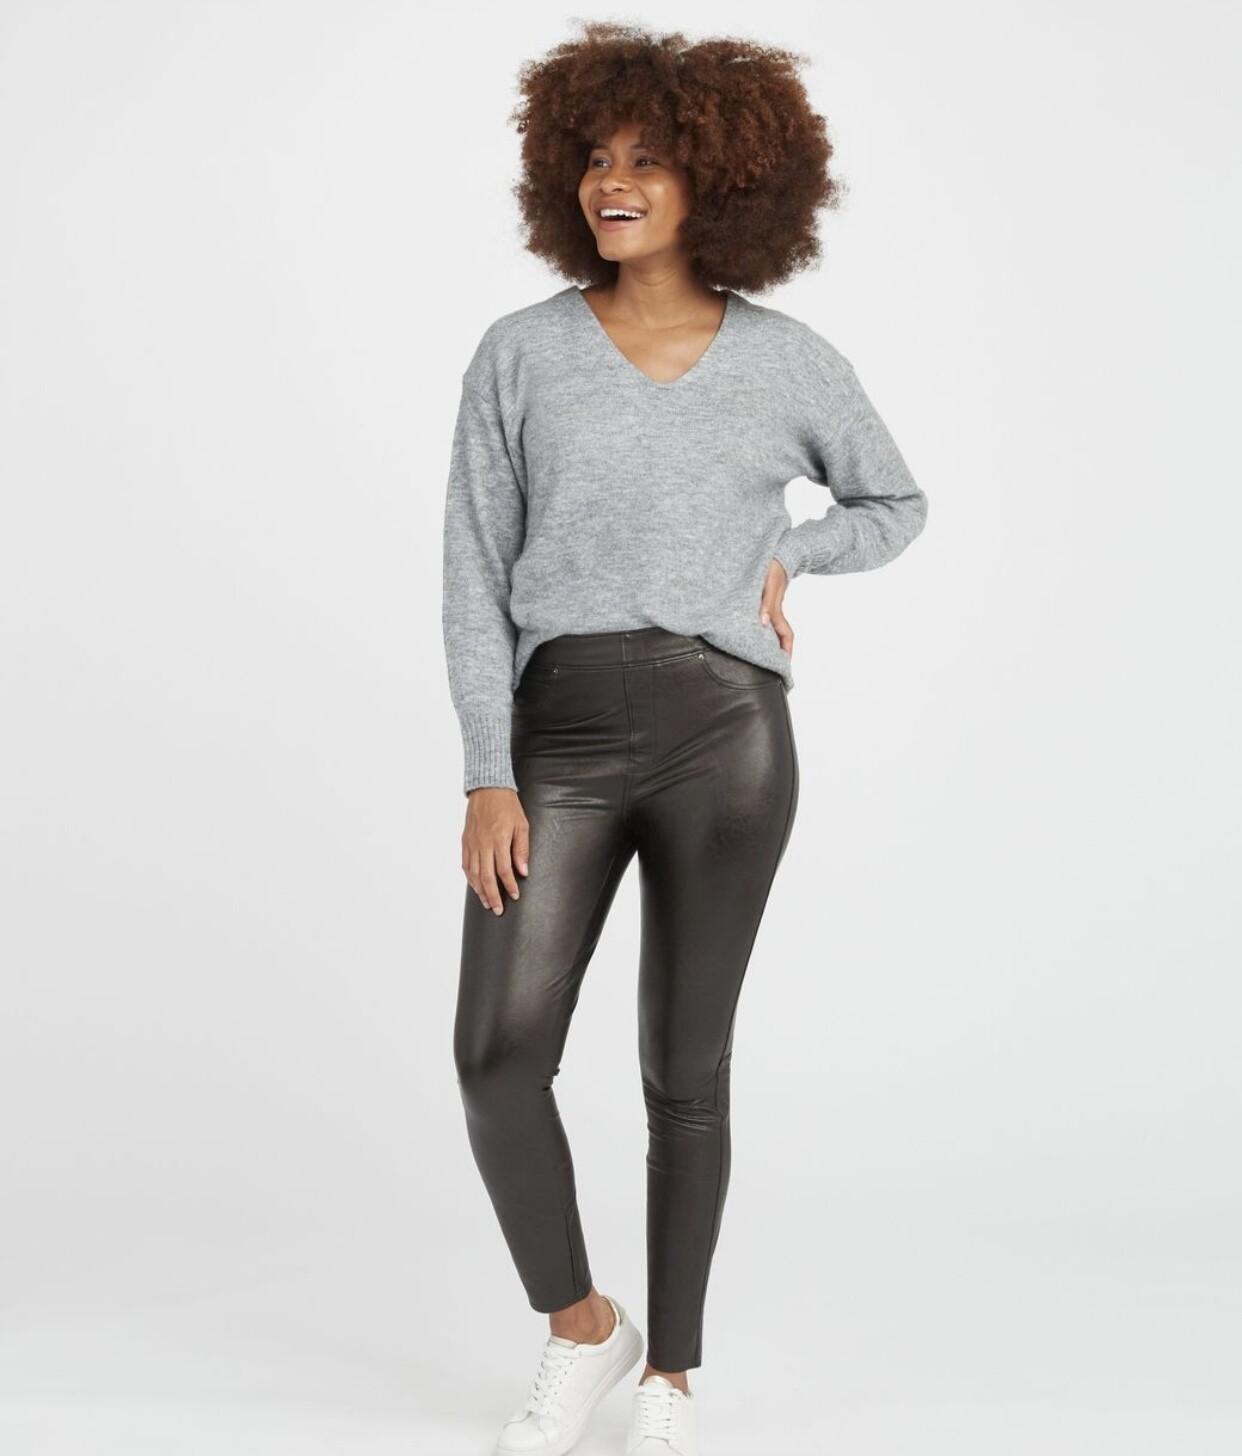 Black Leather-Like Pant